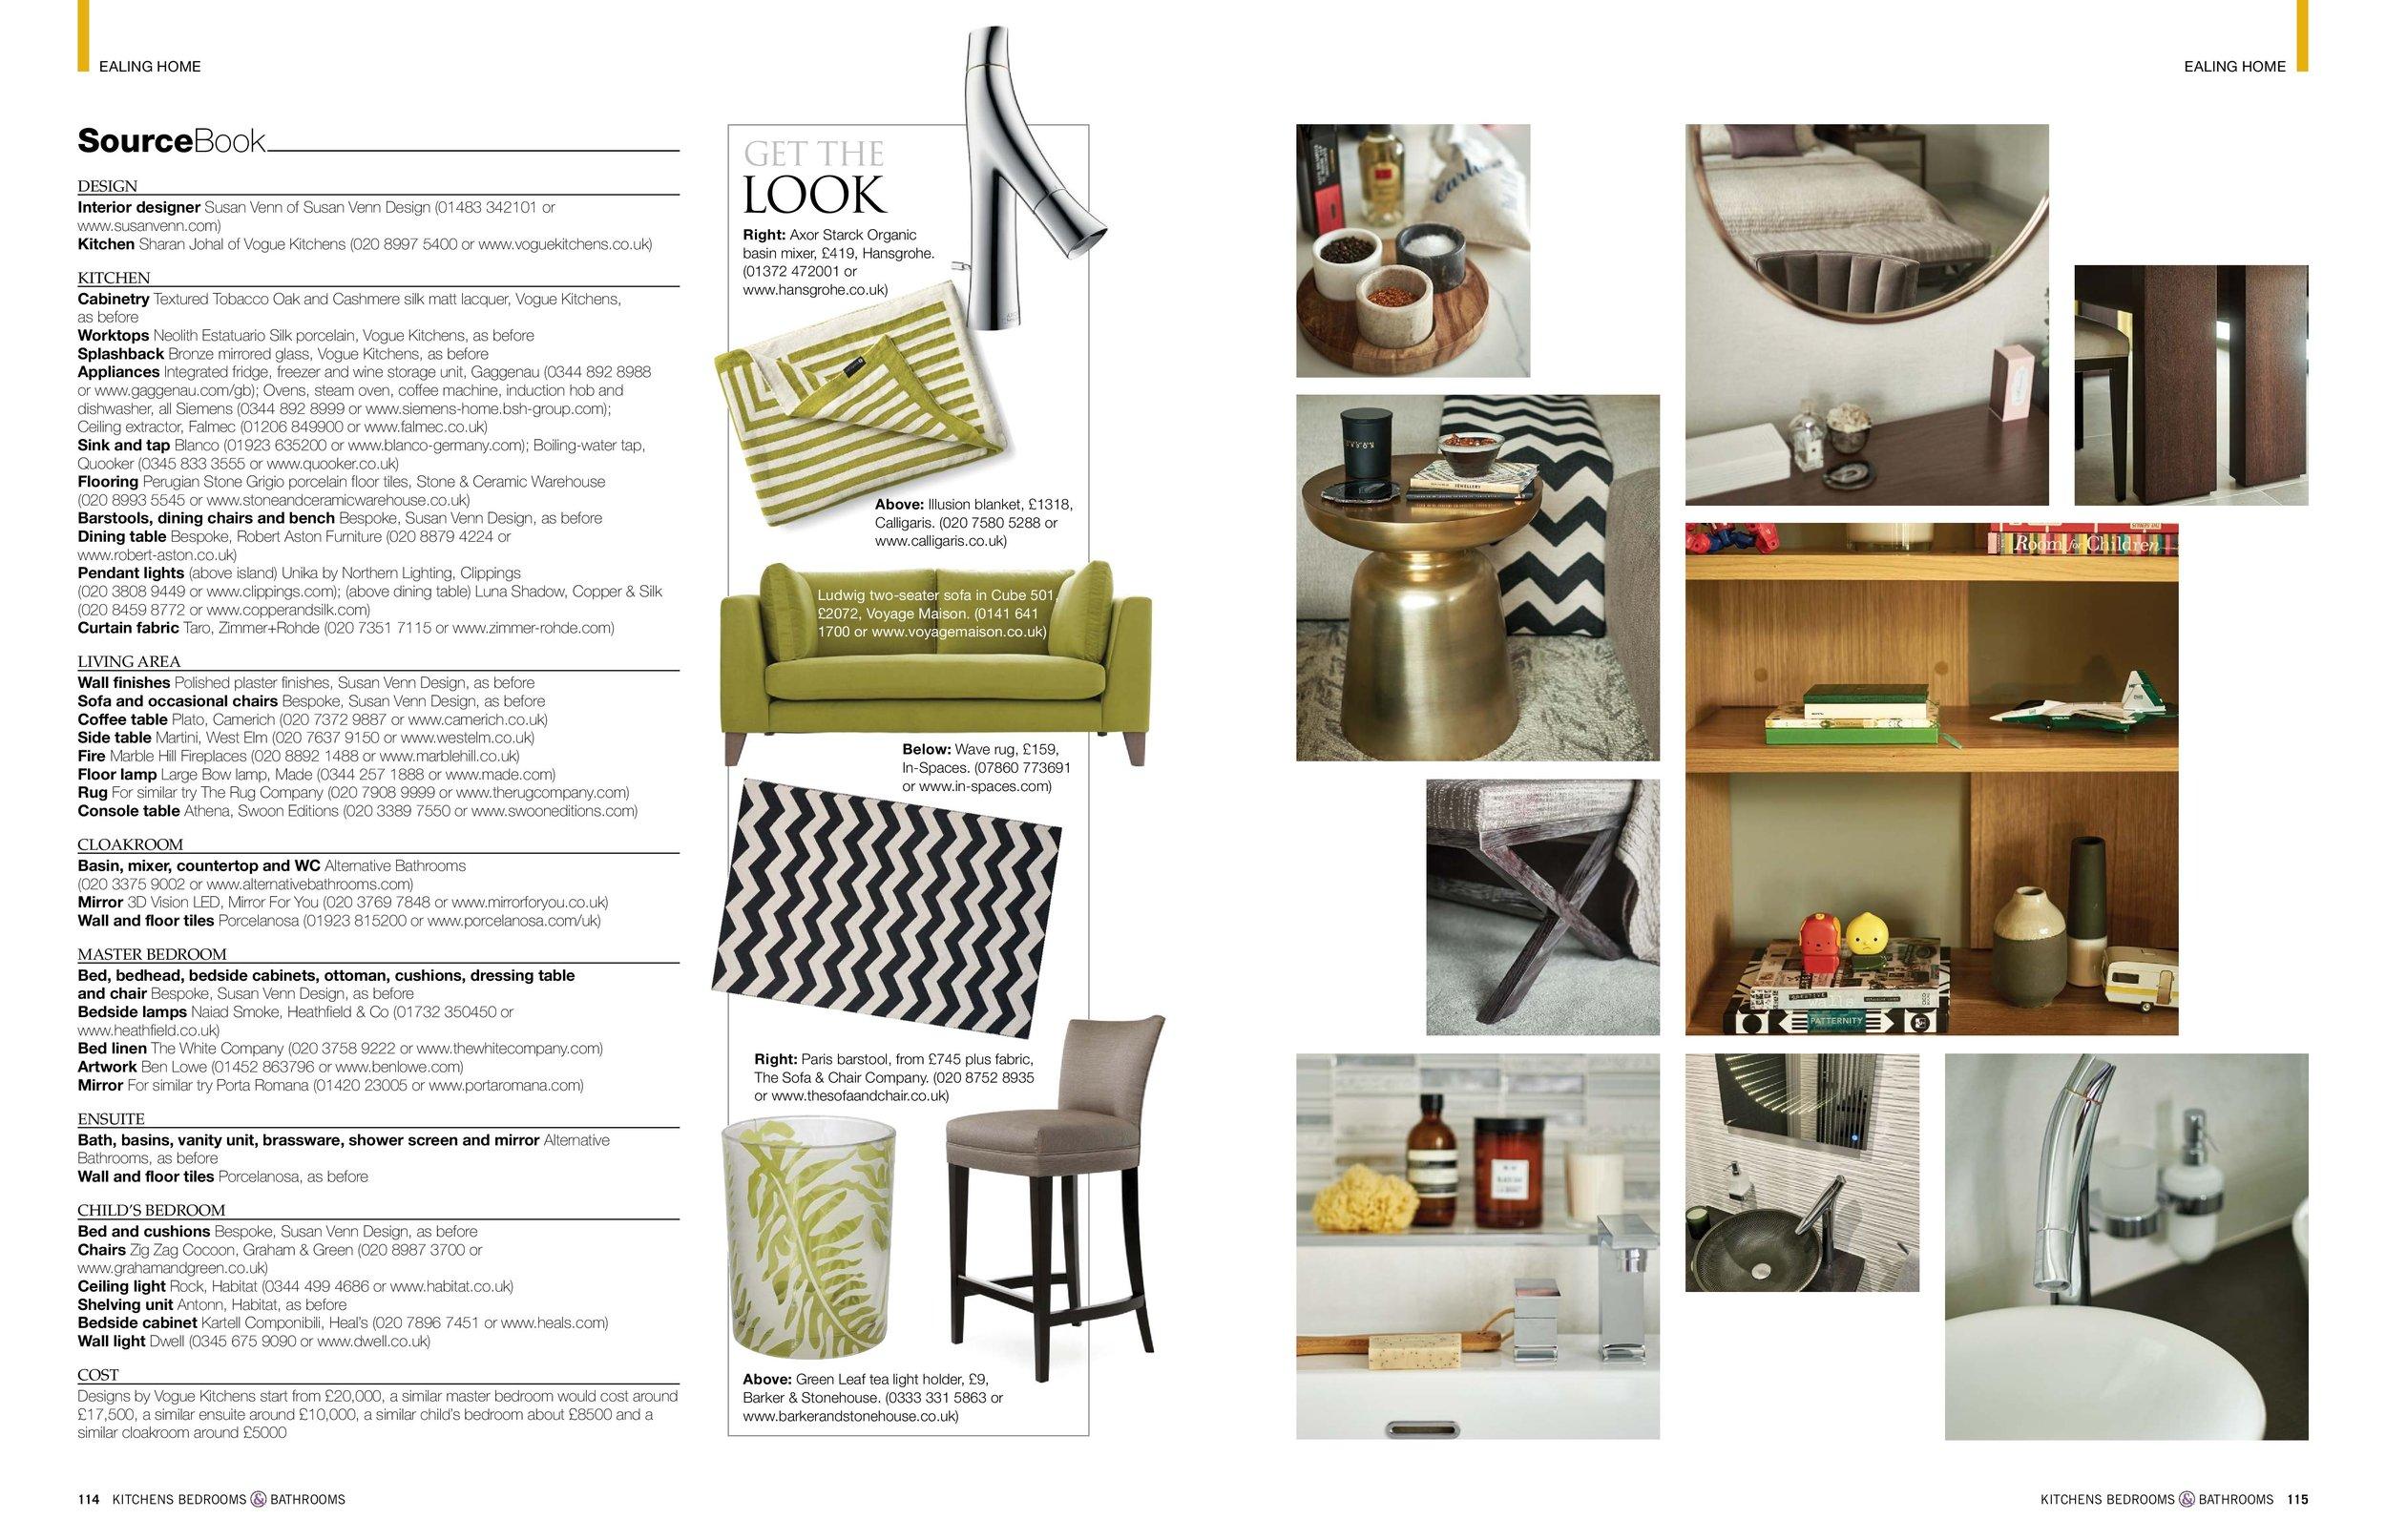 KBBJULY17-Vogue-page-005.jpg